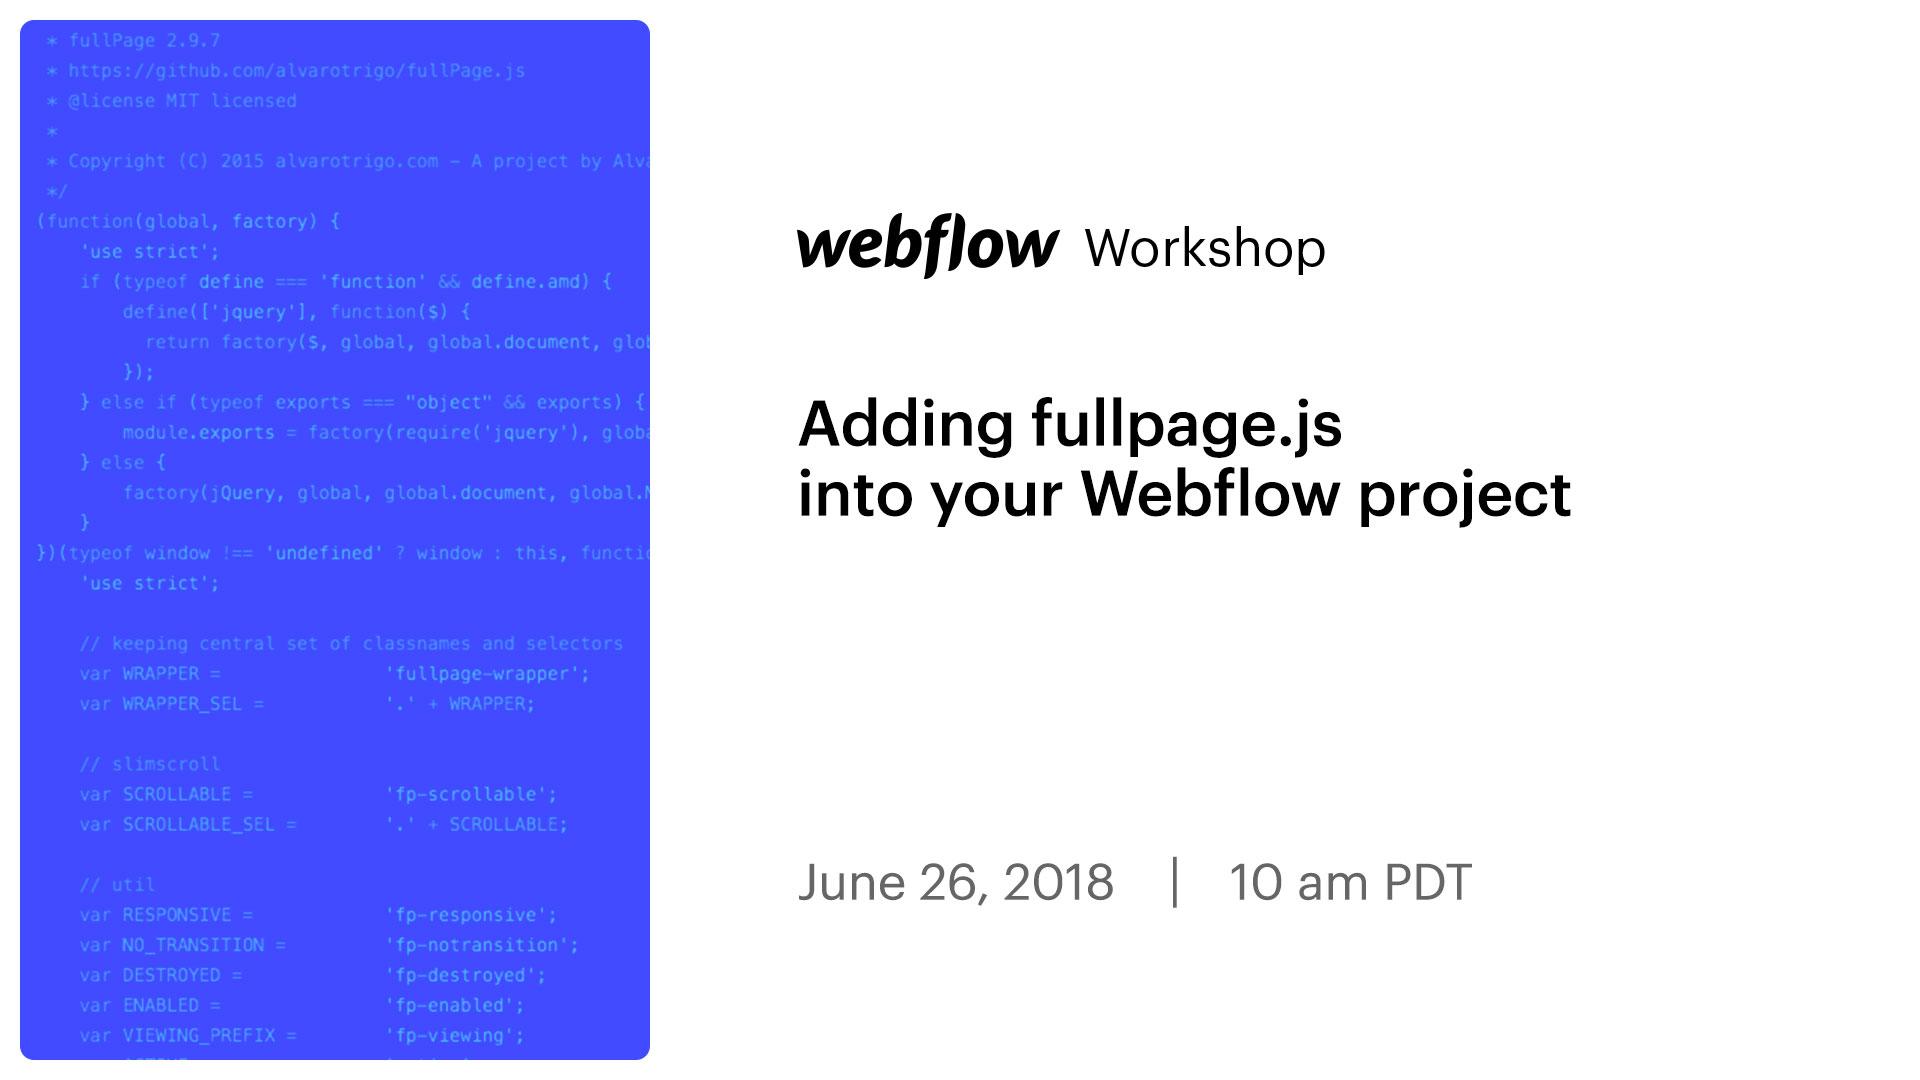 Problem implementing fullpage js code - Feedback - Webflow